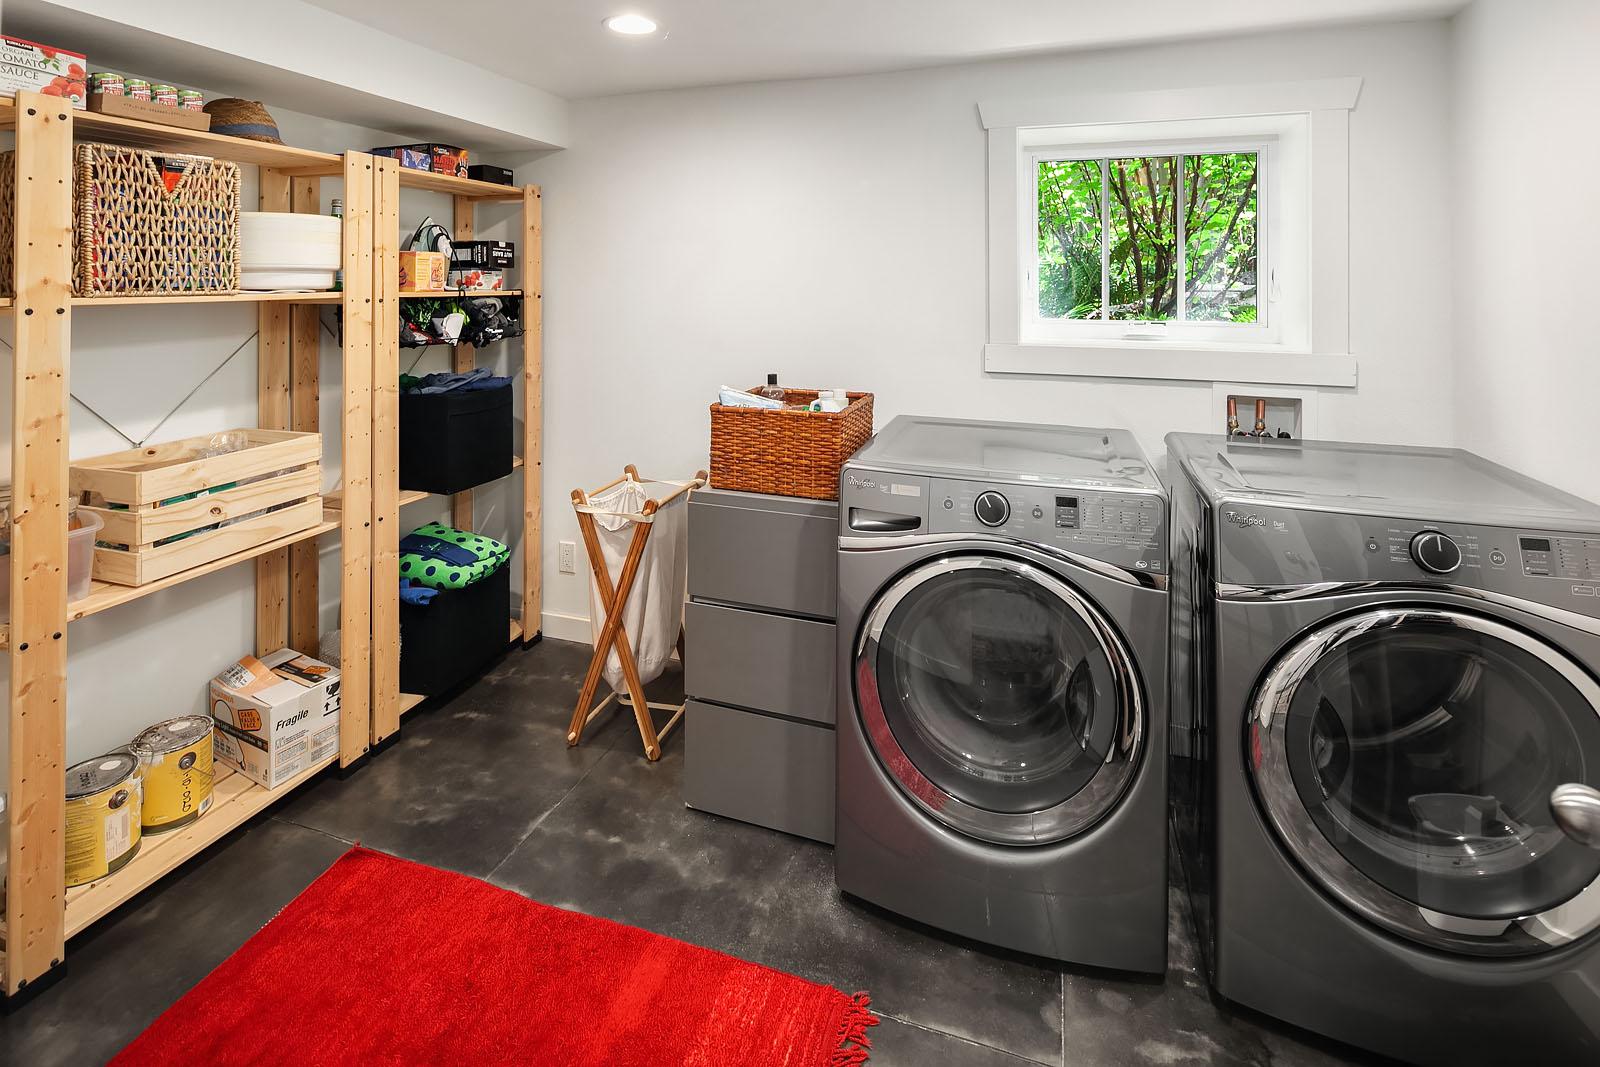 Copy of Plenty of space in the crisp laundry room.